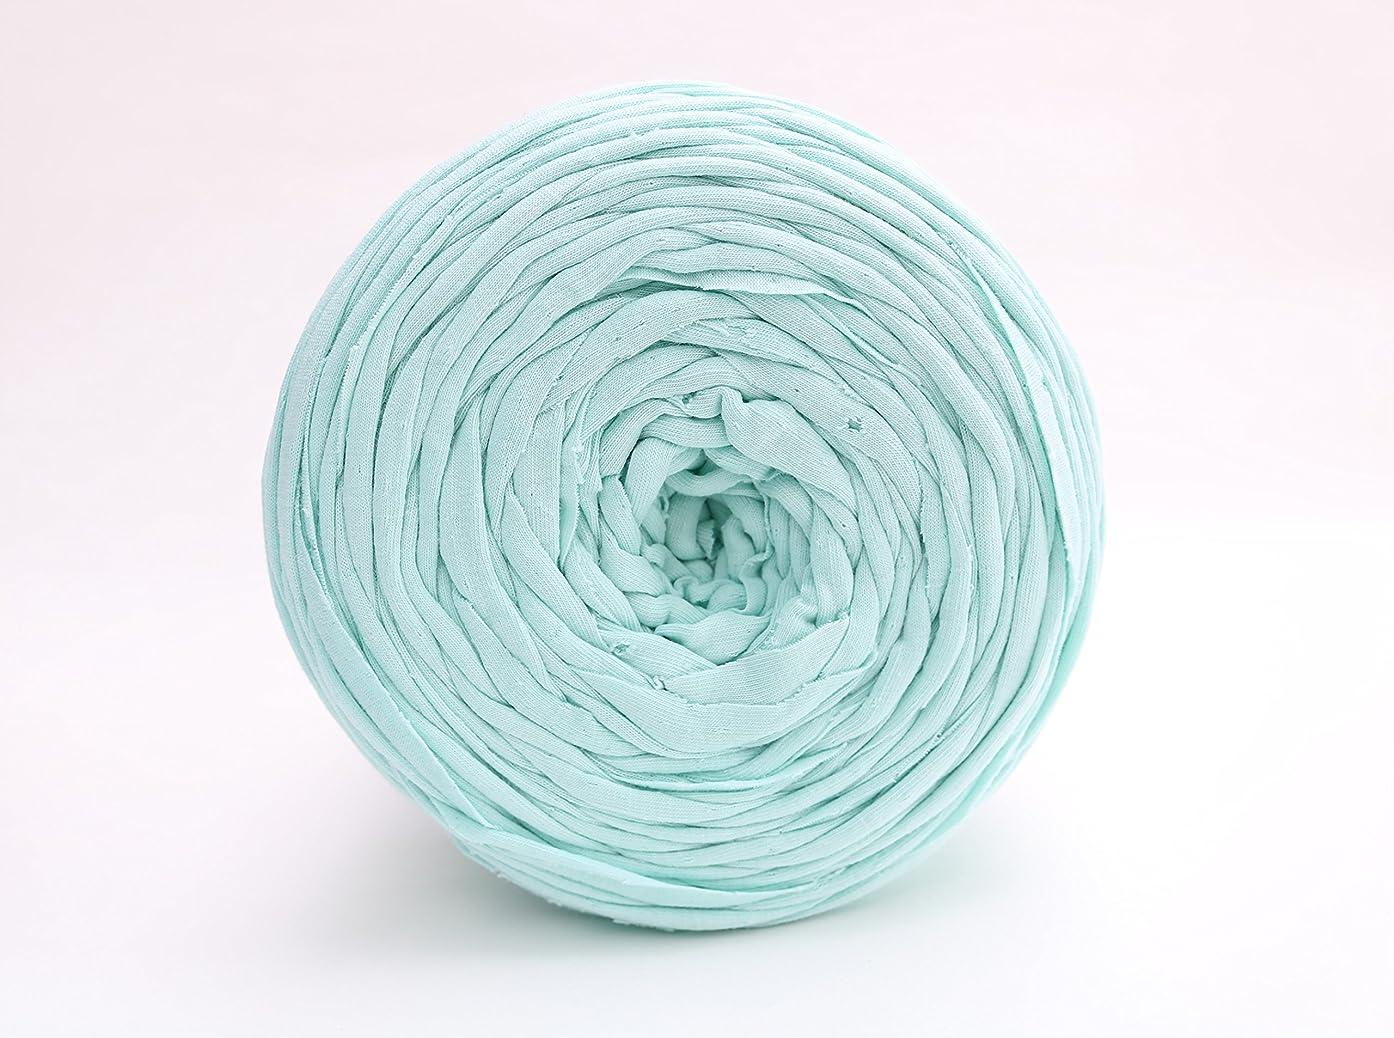 T-Shirt Yarn Recycled 130 Yards 1.5 lb Bulky Yarn│Jersey Yarn│Fabric Yarn │T Shirt Yarn for Crochet │ Knitting Tshirt Yarn │ Home Decor DYI Supply │ Recycled Yarn │Trapillo (Baby Green)